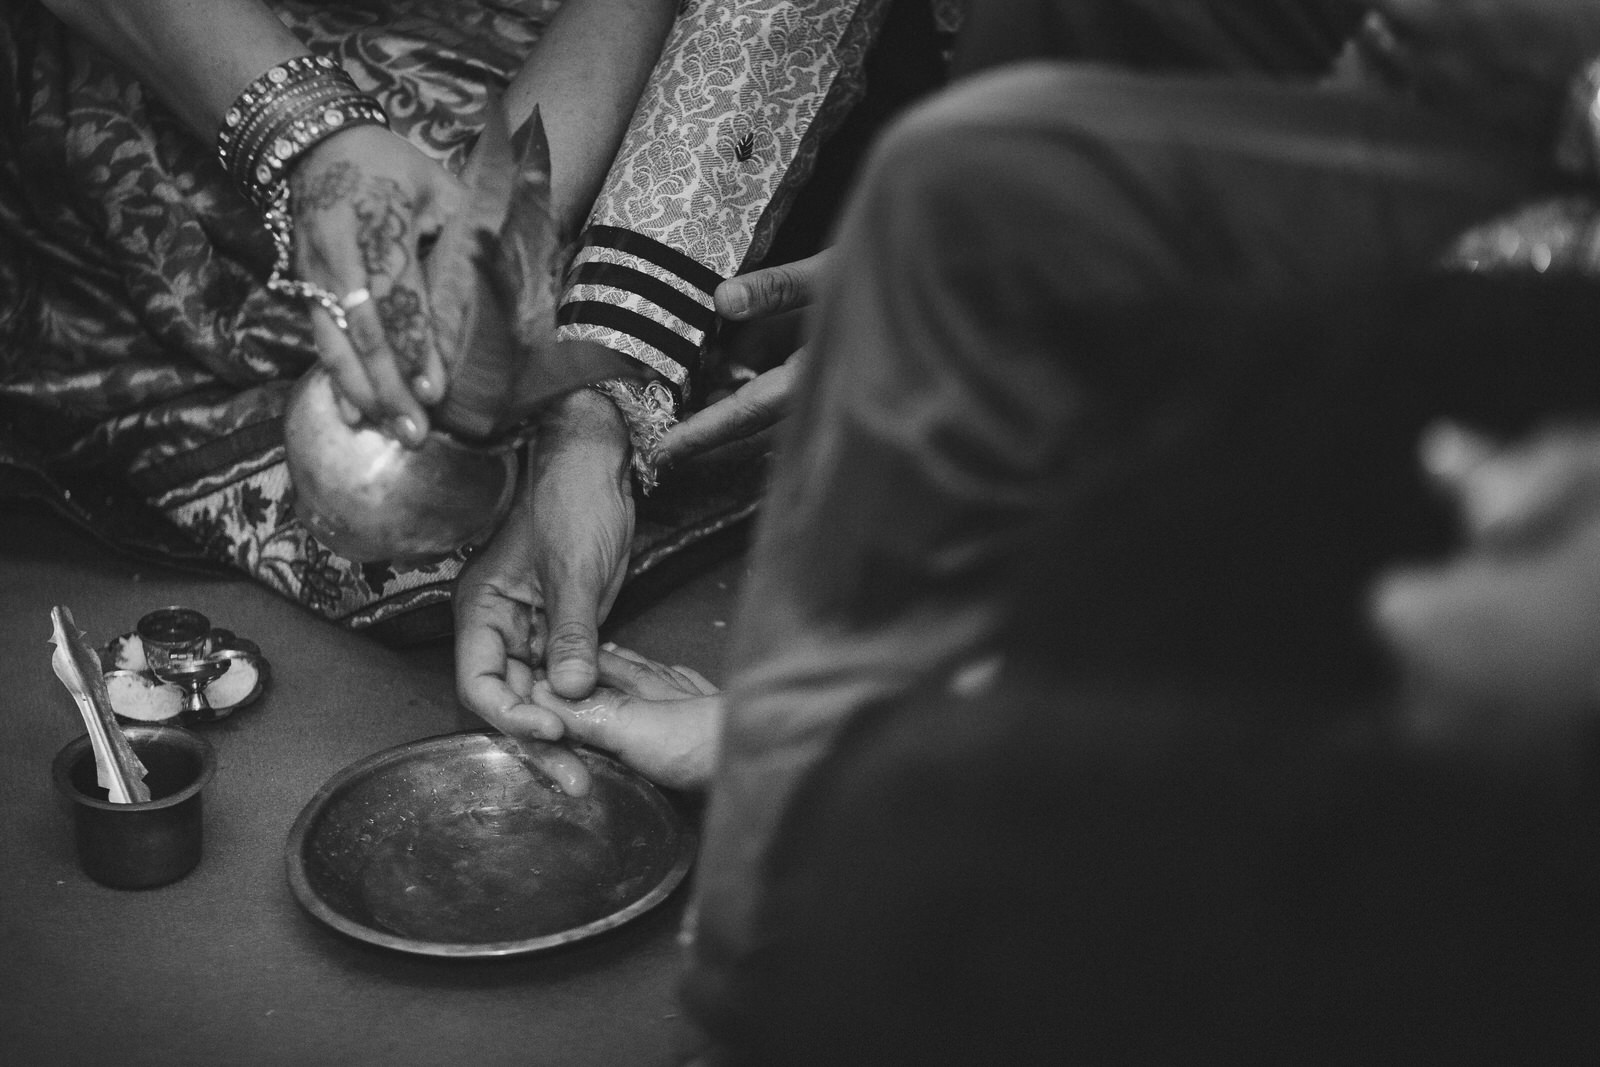 destination-wedding-photographer-Kerala-india-30.JPG